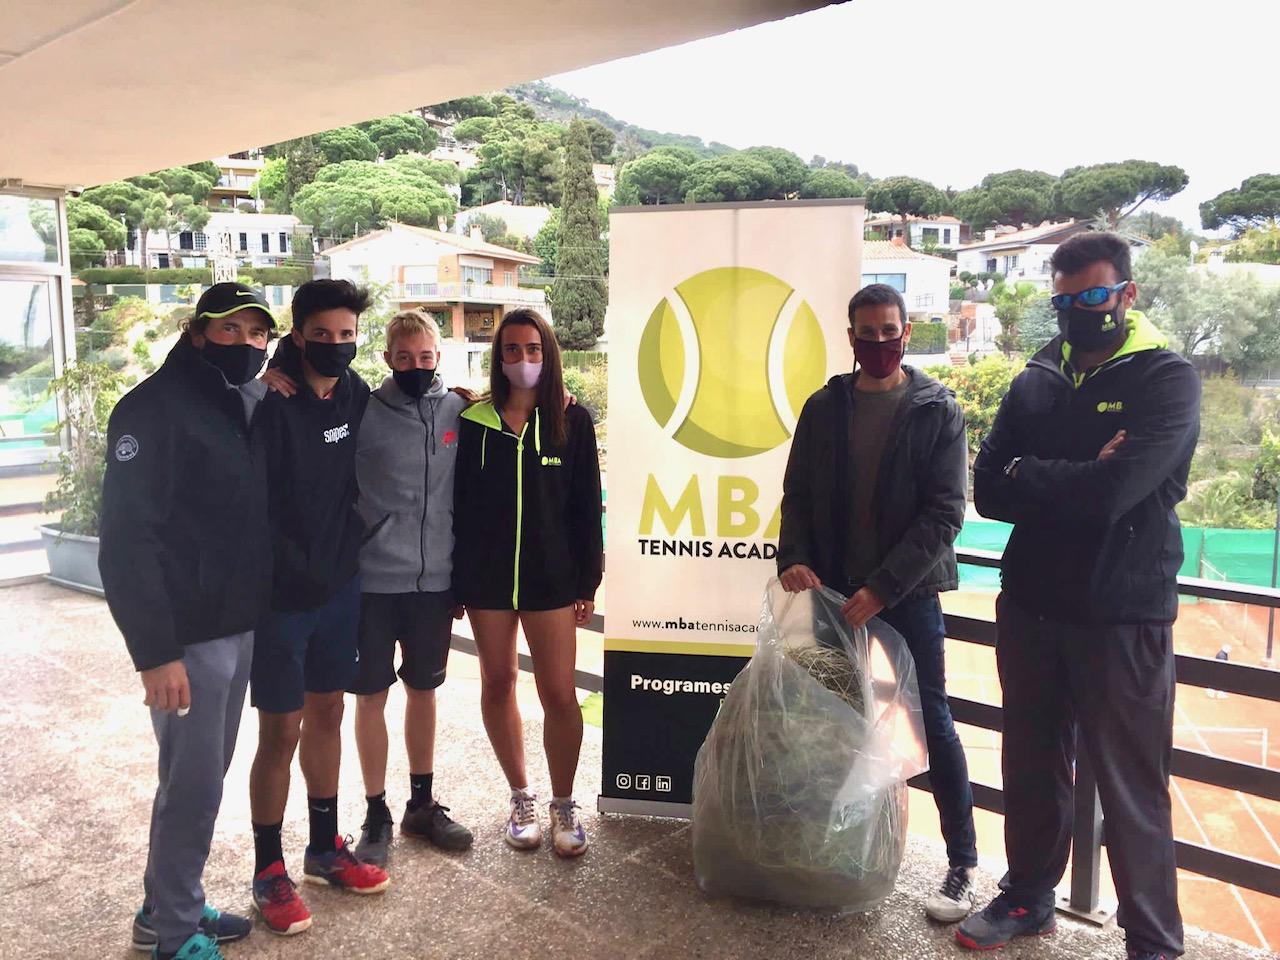 Entrega cordajes en MBA Tennis Academy